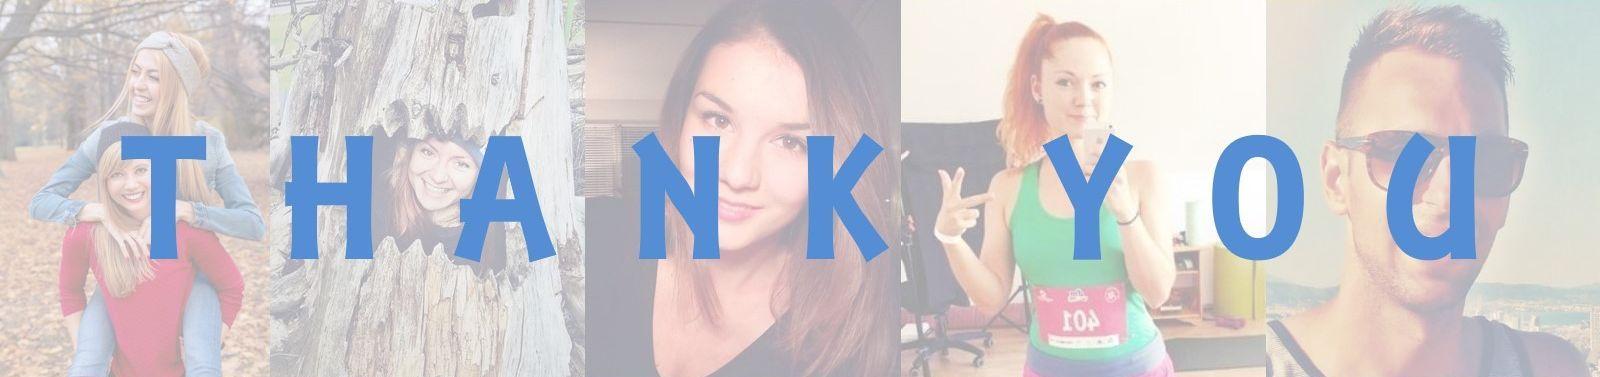 thankyou_for_yourdonation_welcometobratislava_team